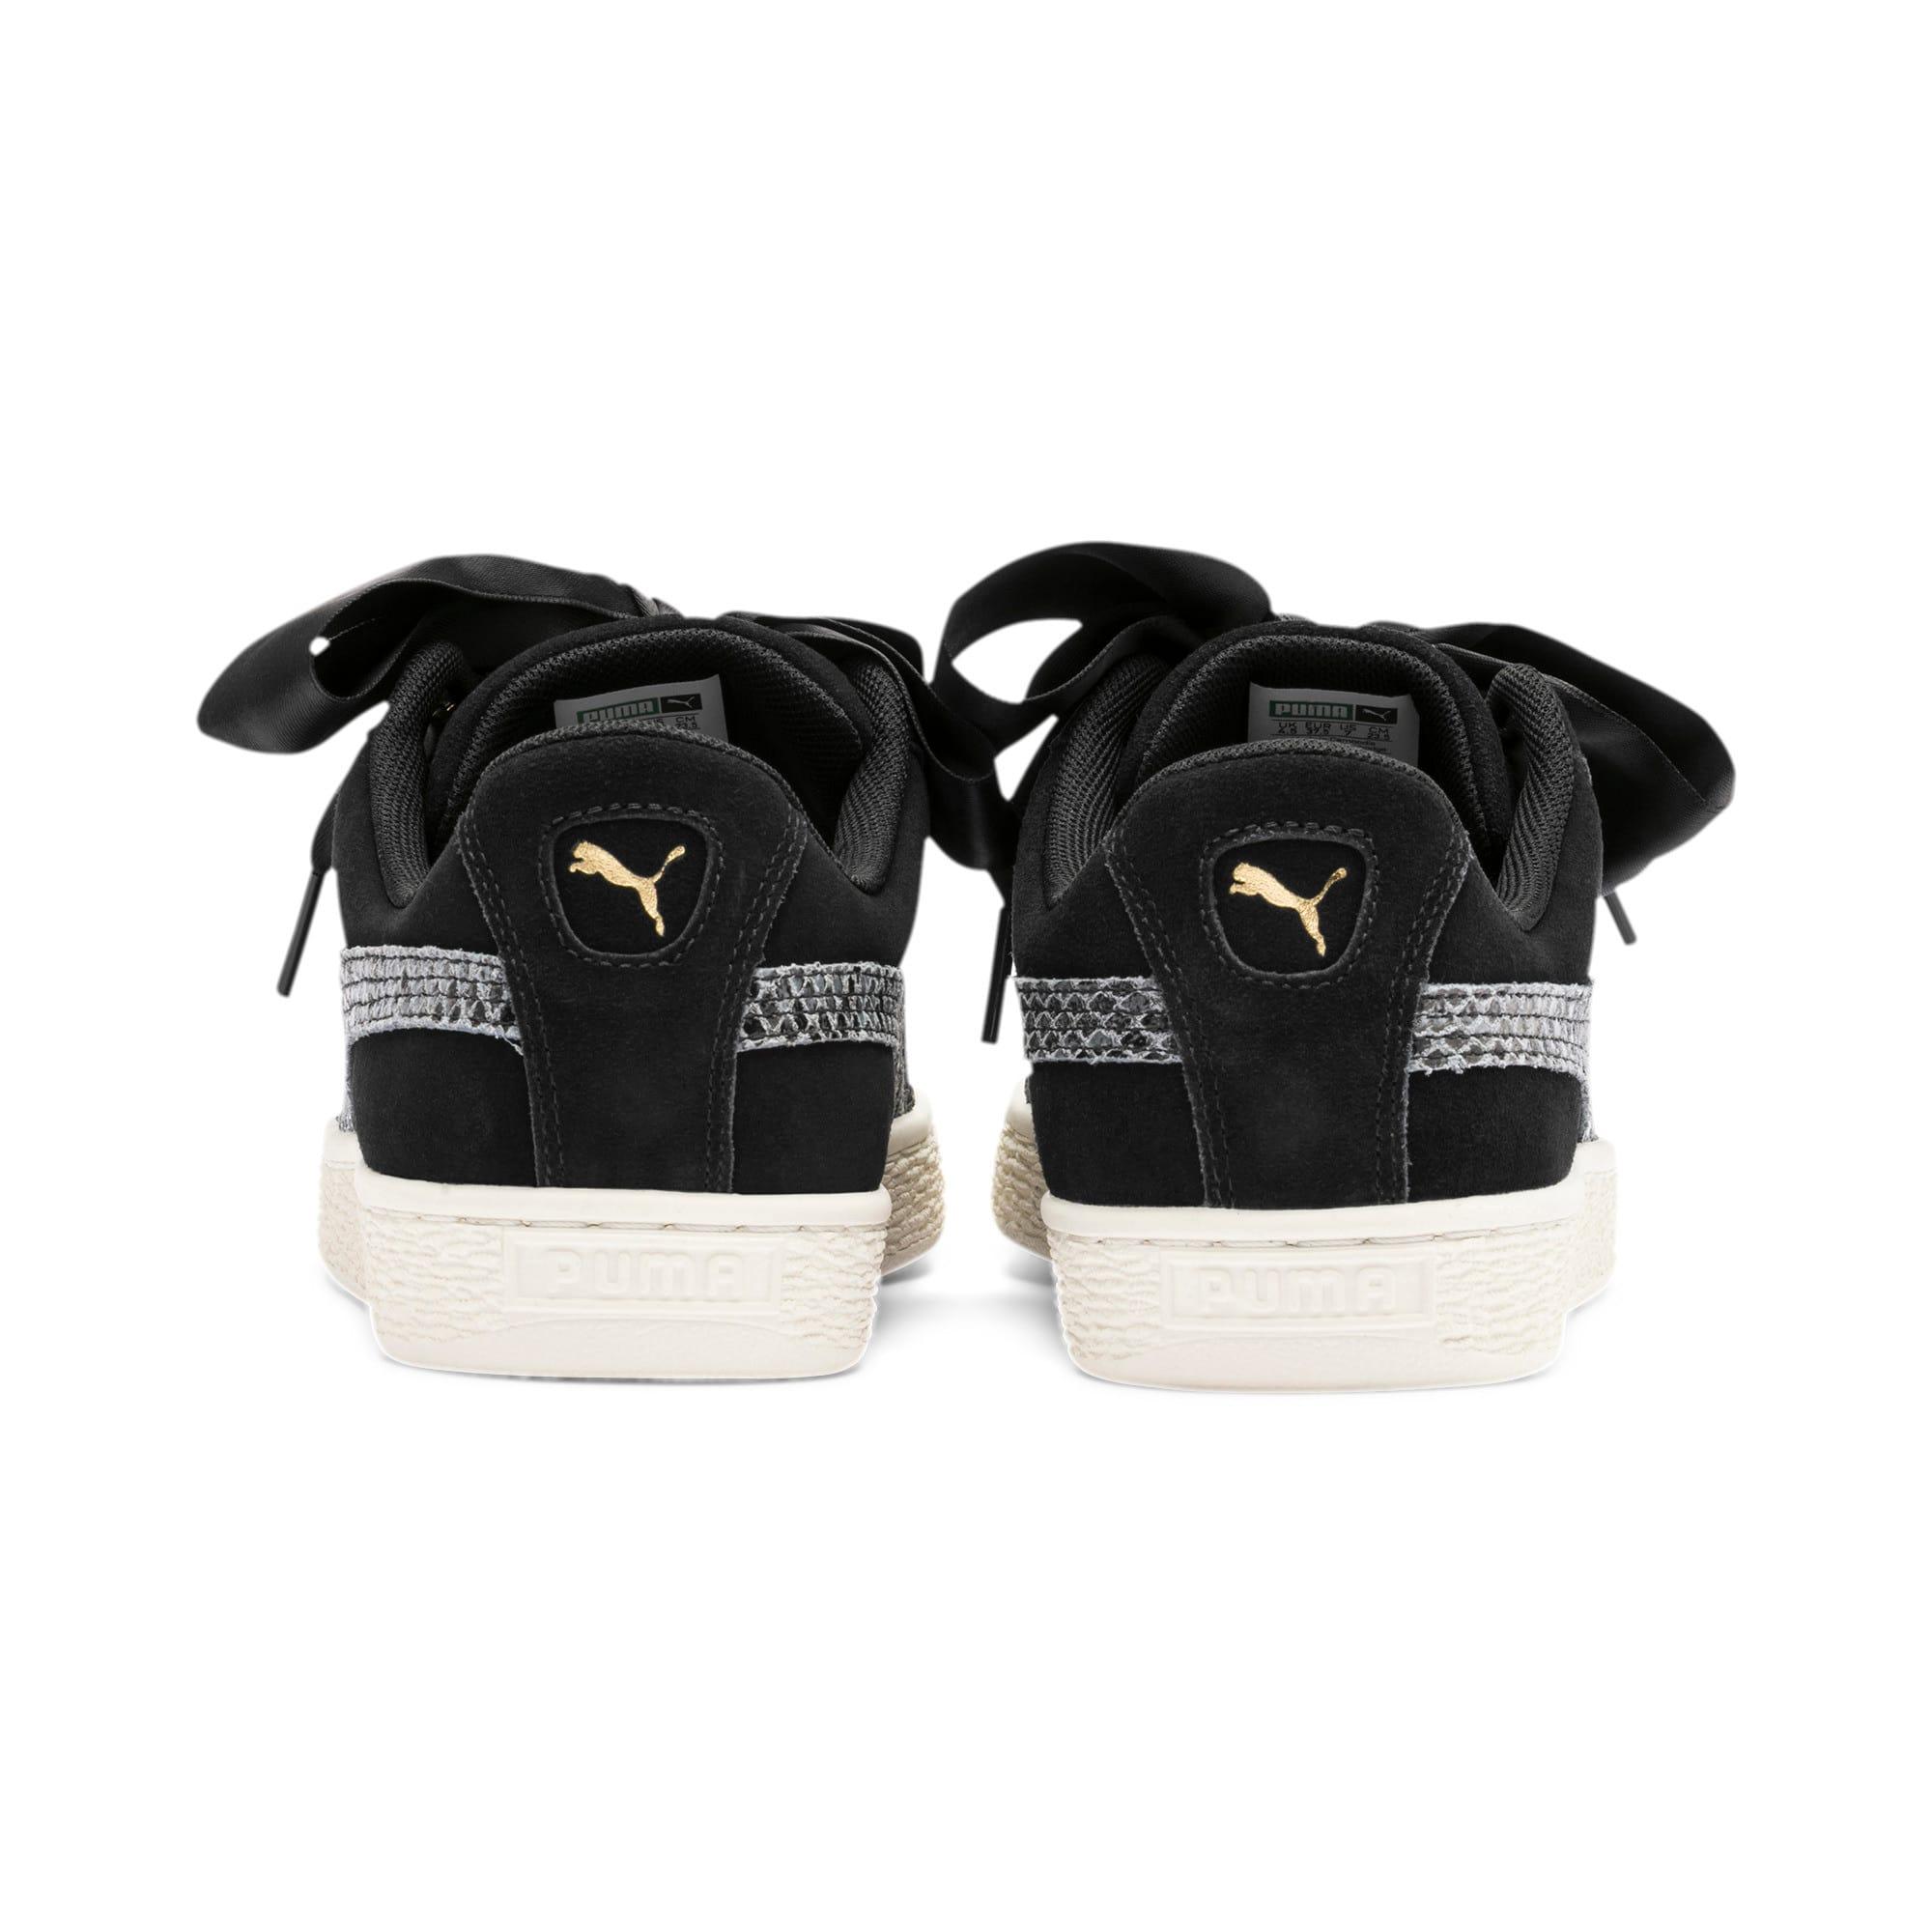 Thumbnail 4 of Suede Heart Snake Lux Women's Sneakers, Puma Black-Puma Team Gold, medium